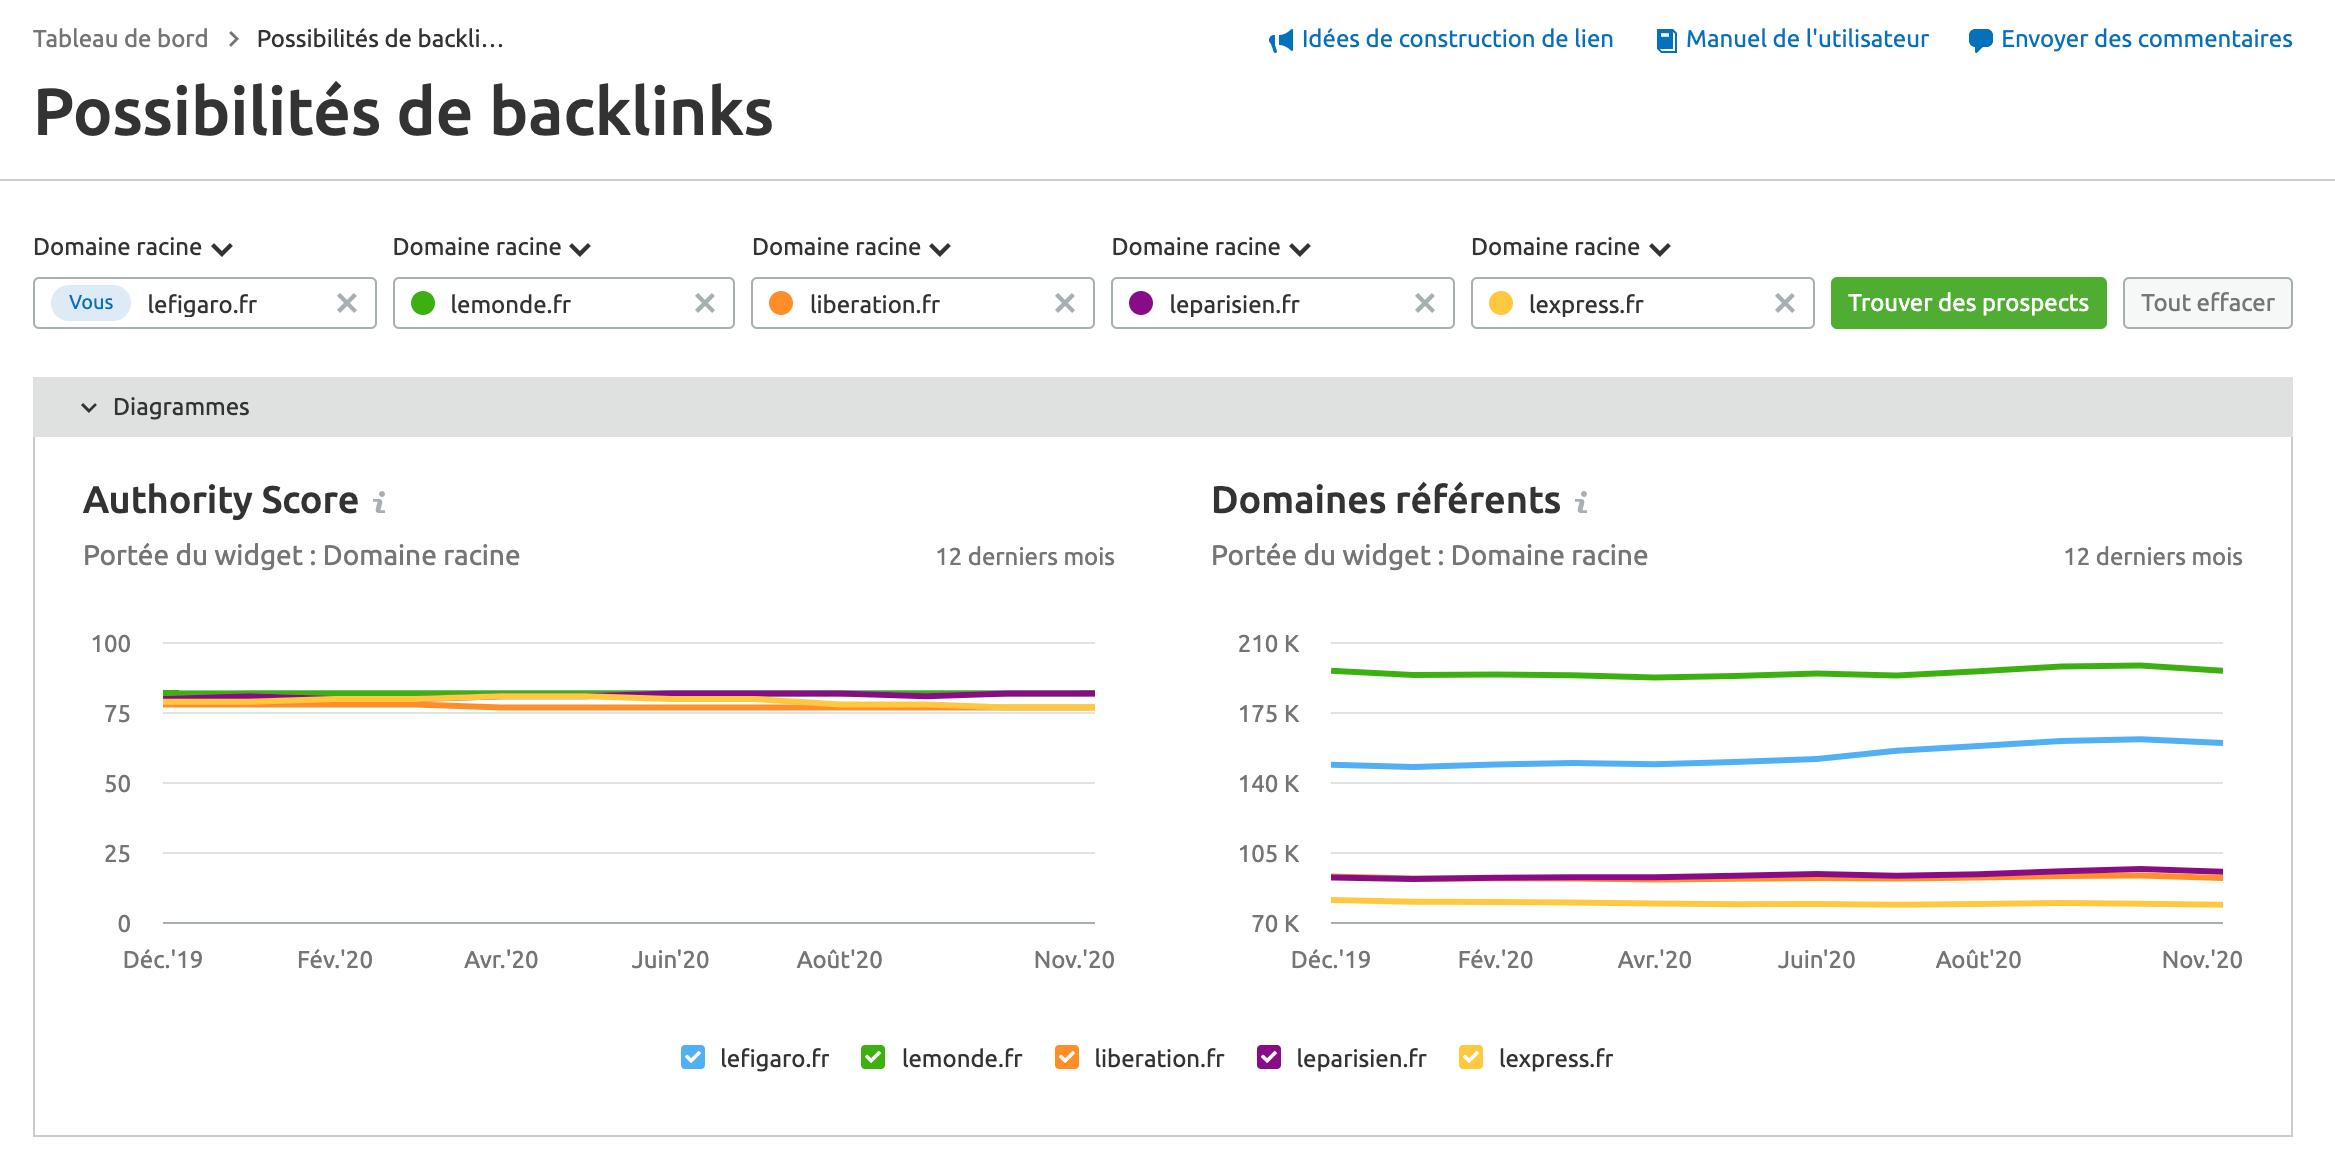 possibilités de backlinks